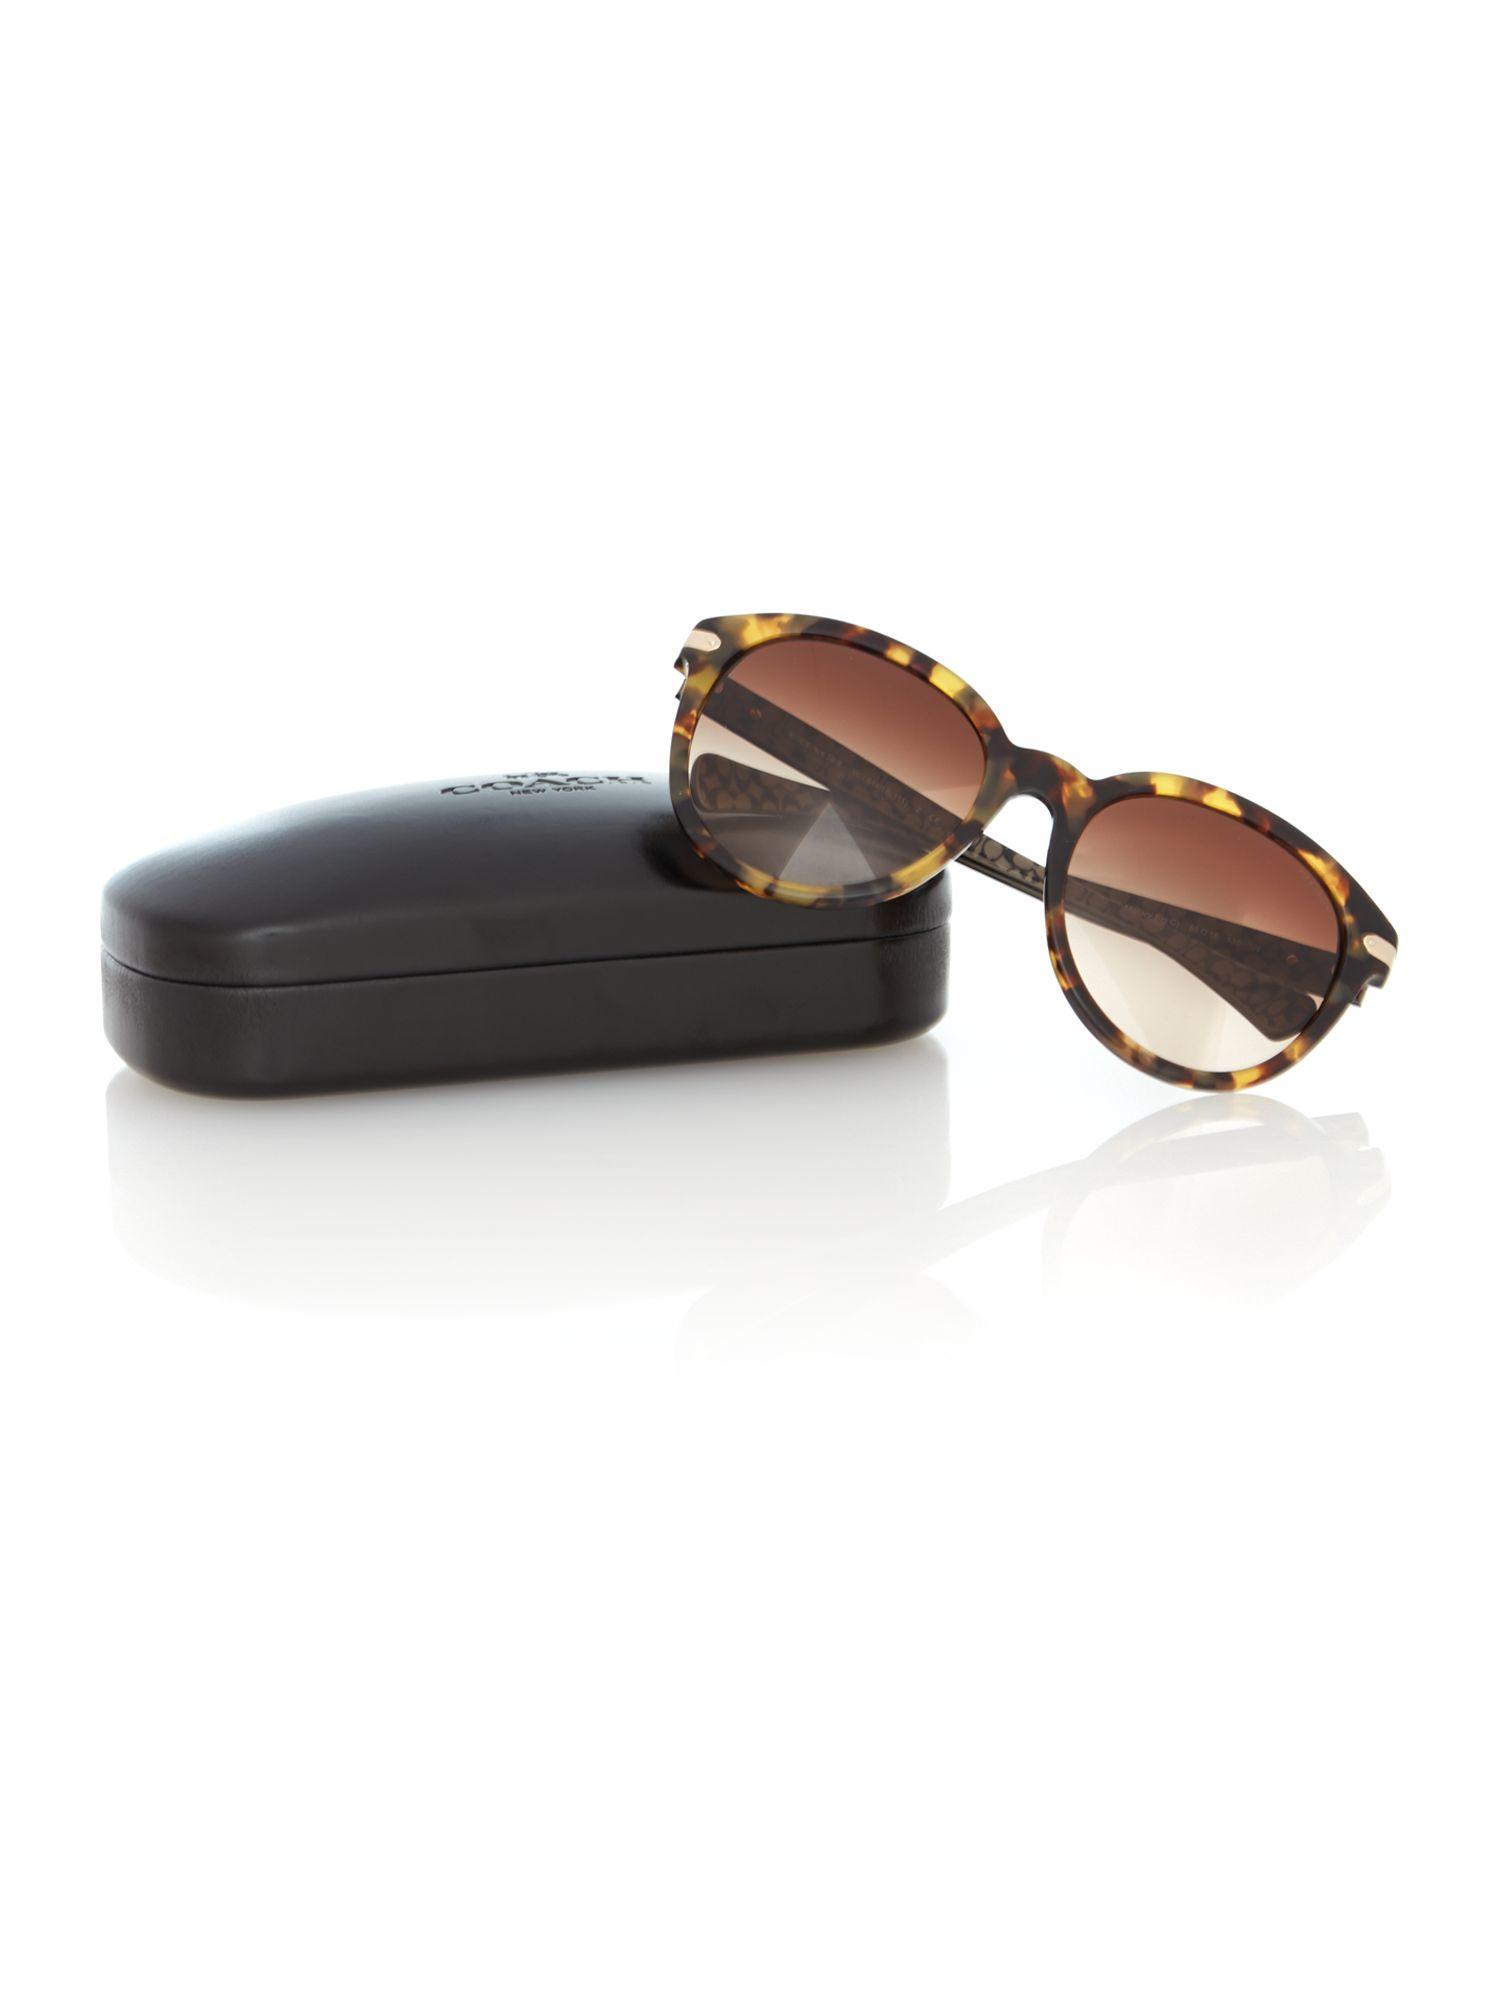 7ea50a2636ba8 ... ireland coach hc8140 round sunglasses in brown lyst 67c67 a489e